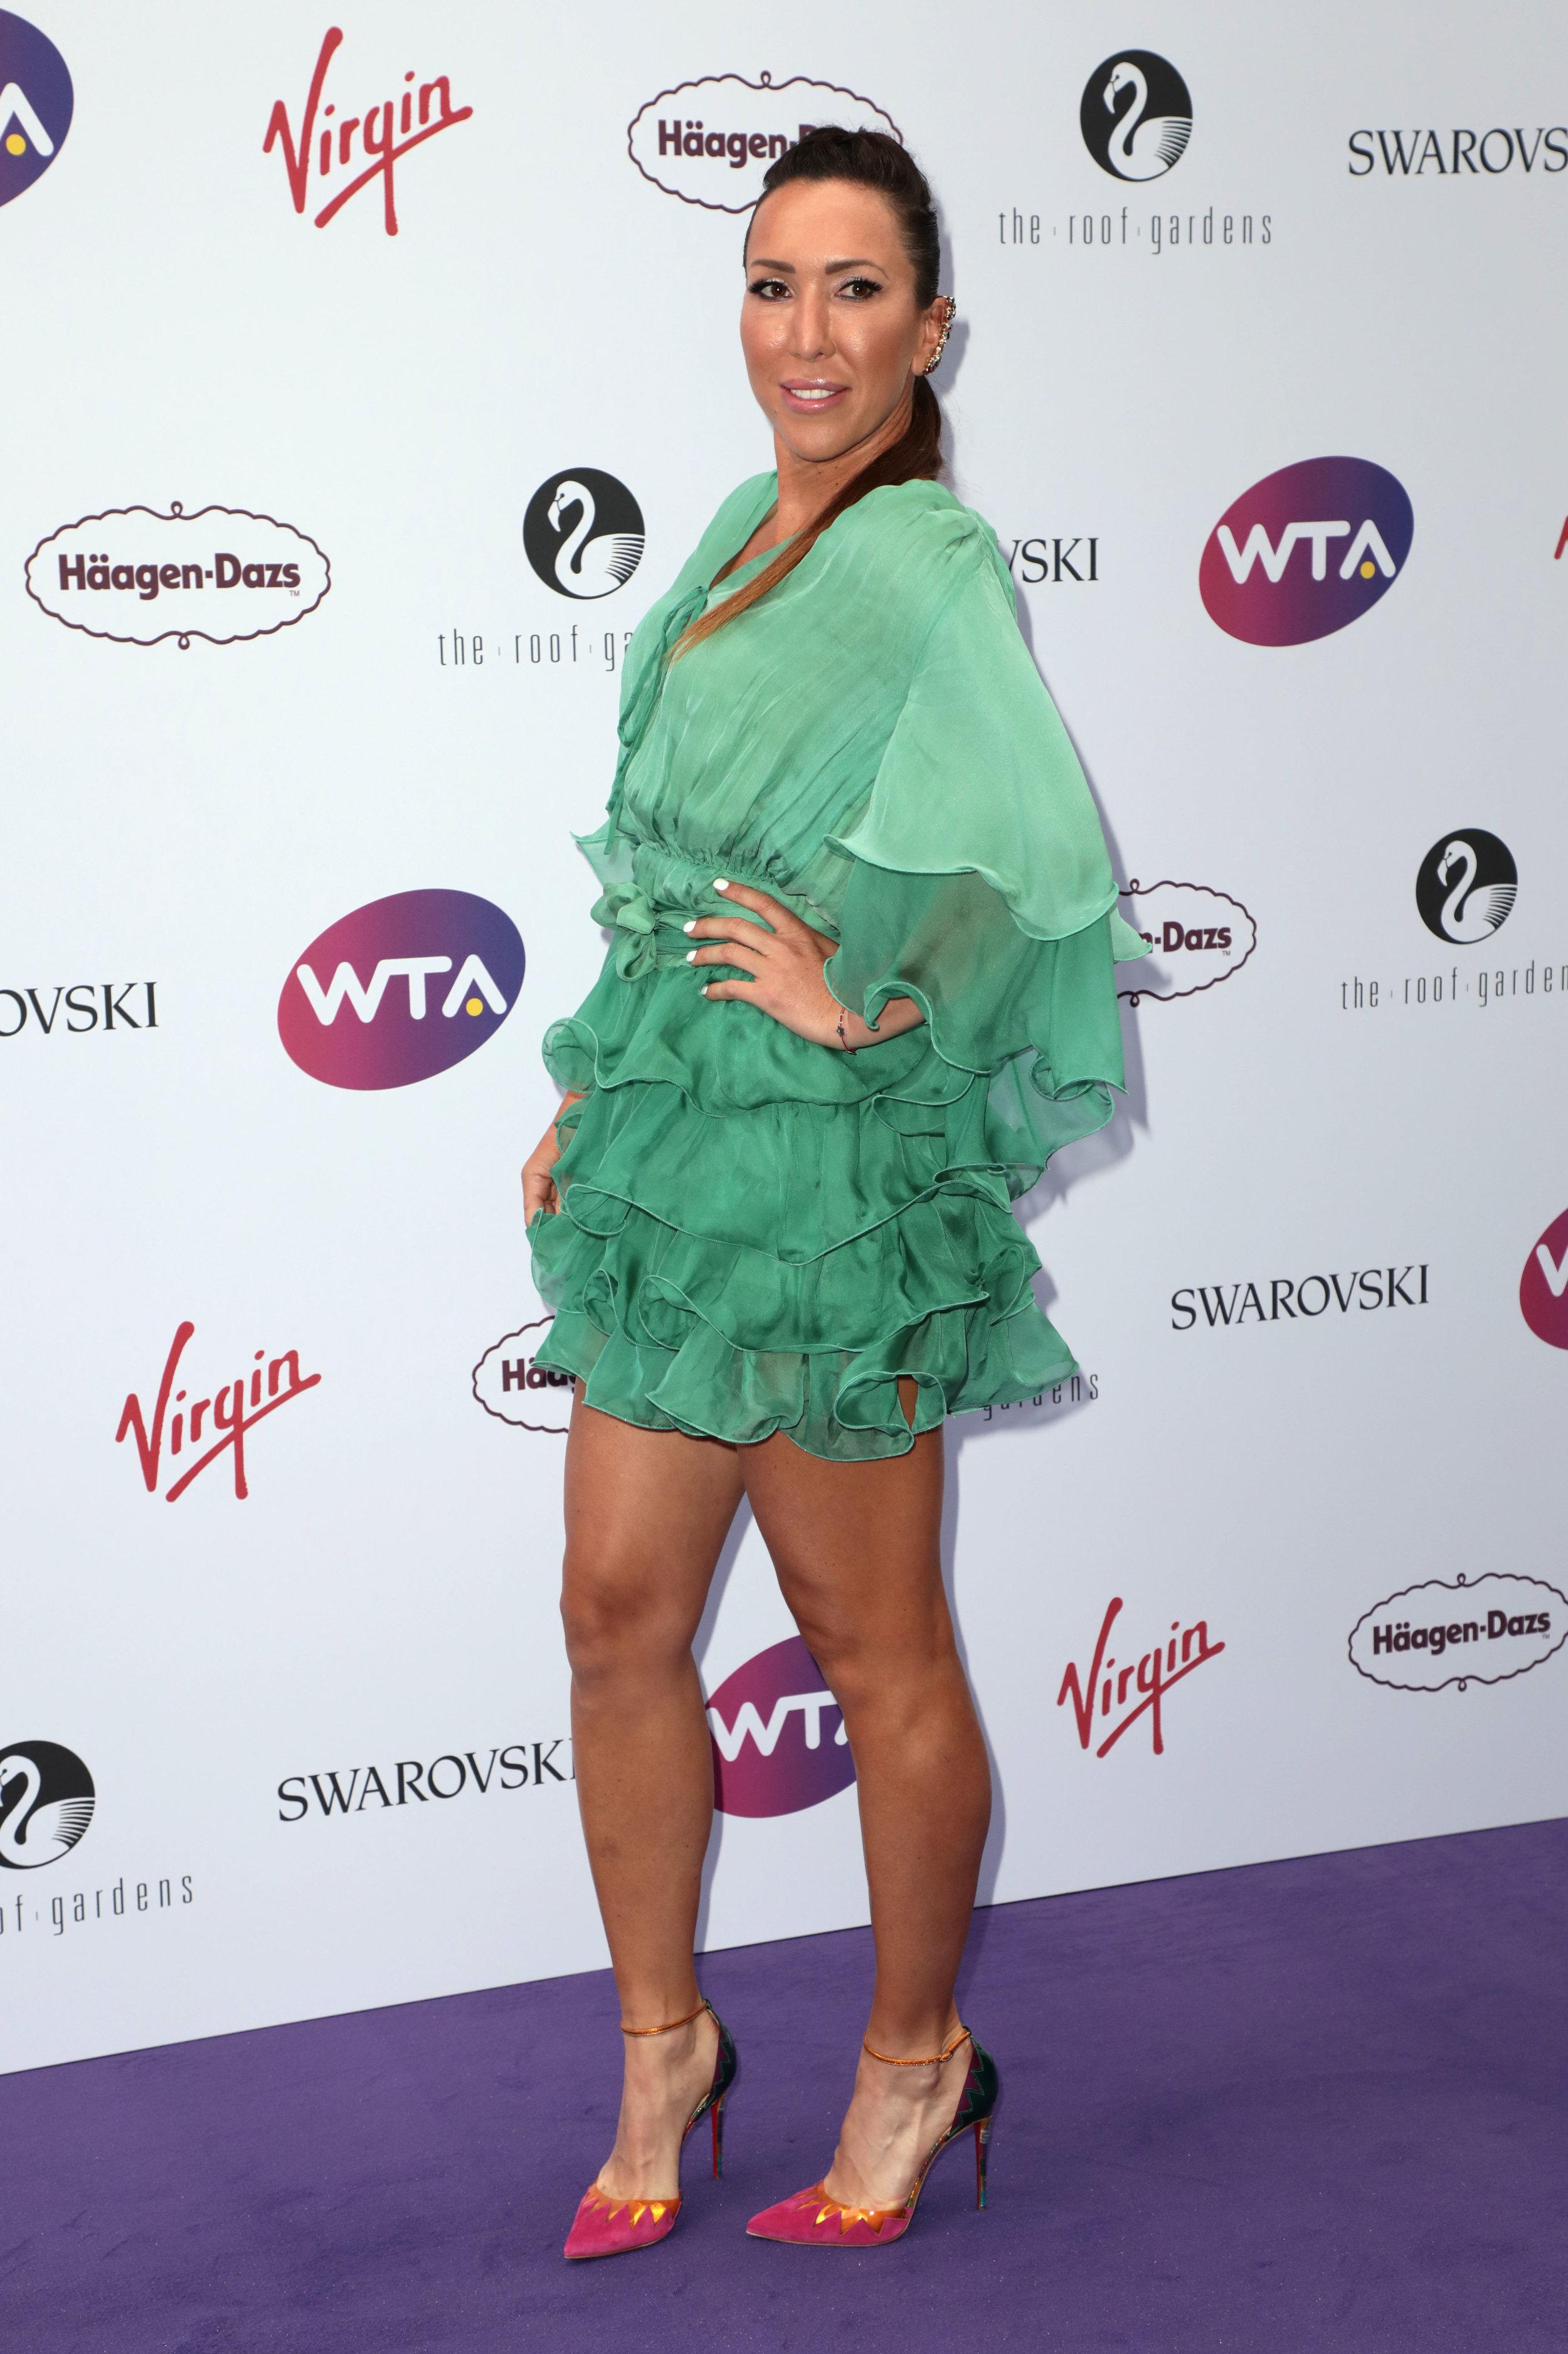 PHT_B5327_WTA_Pre_Wimbledon_Party_13790.JPG